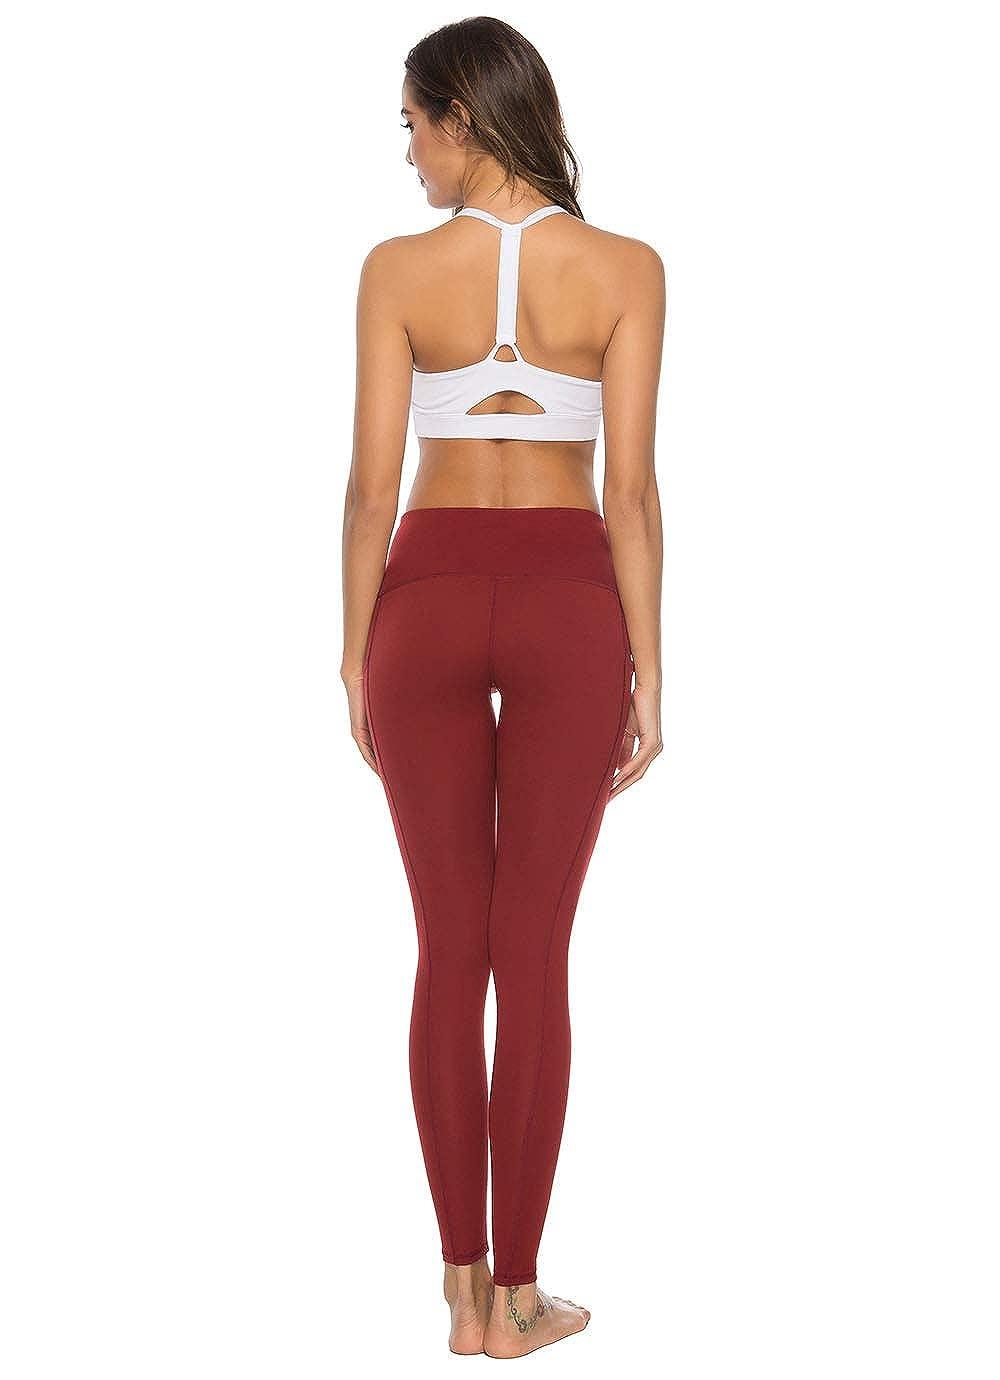 Mint Lilac Women/'s High Waist Tummy Control Yoga Pants Full-Length Workout Leggings